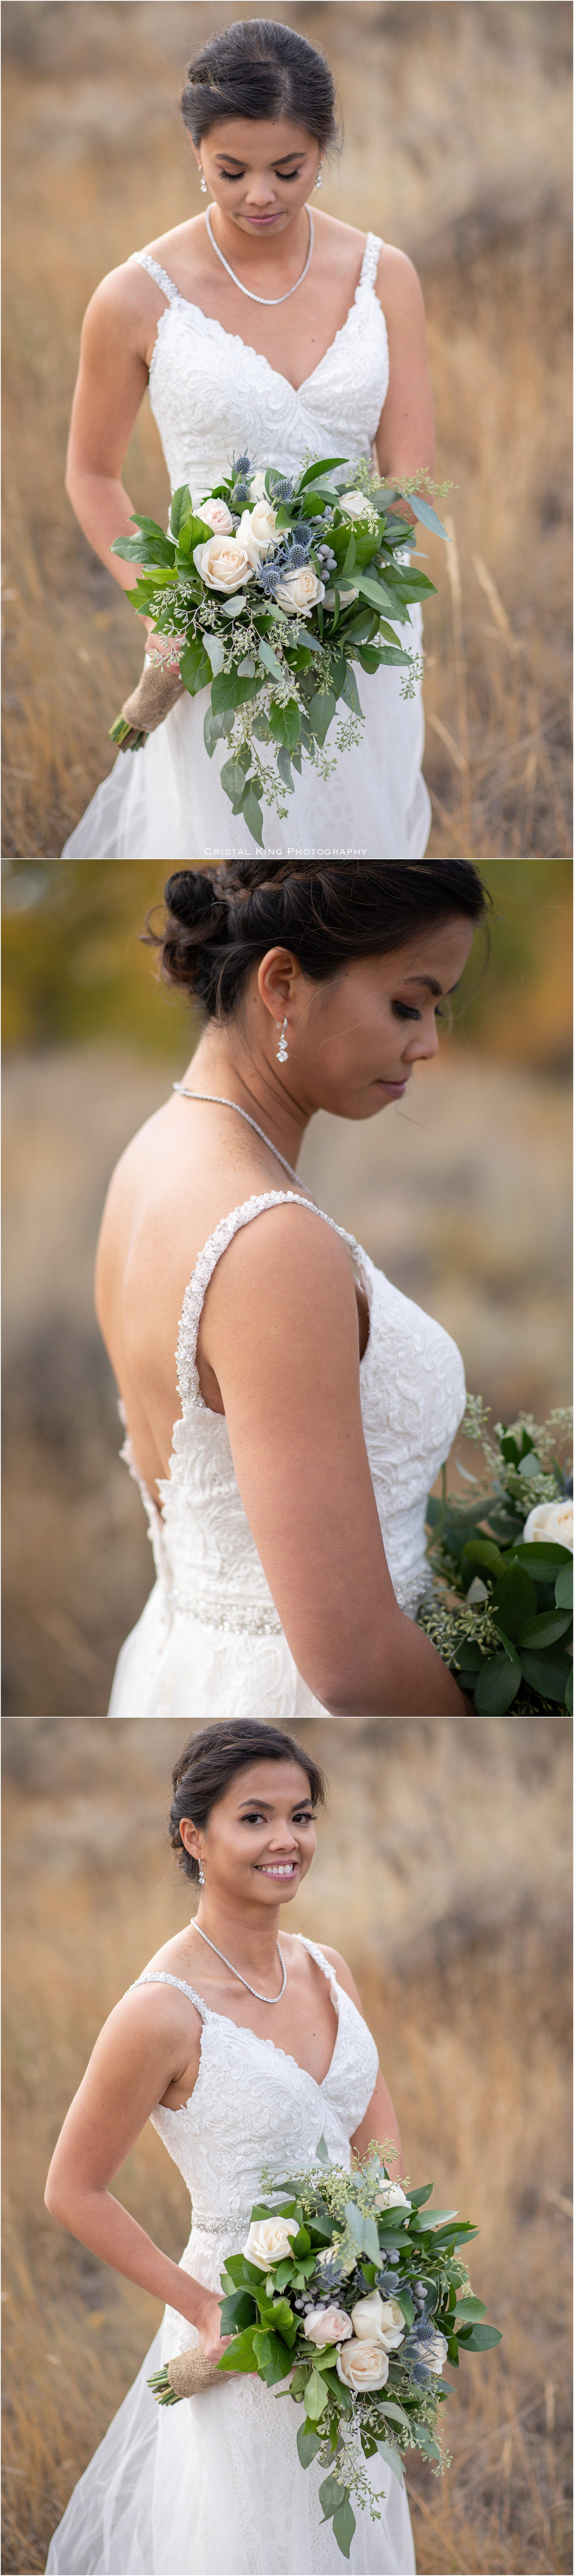 Quynh-Scotts-Wedding-86.jpg